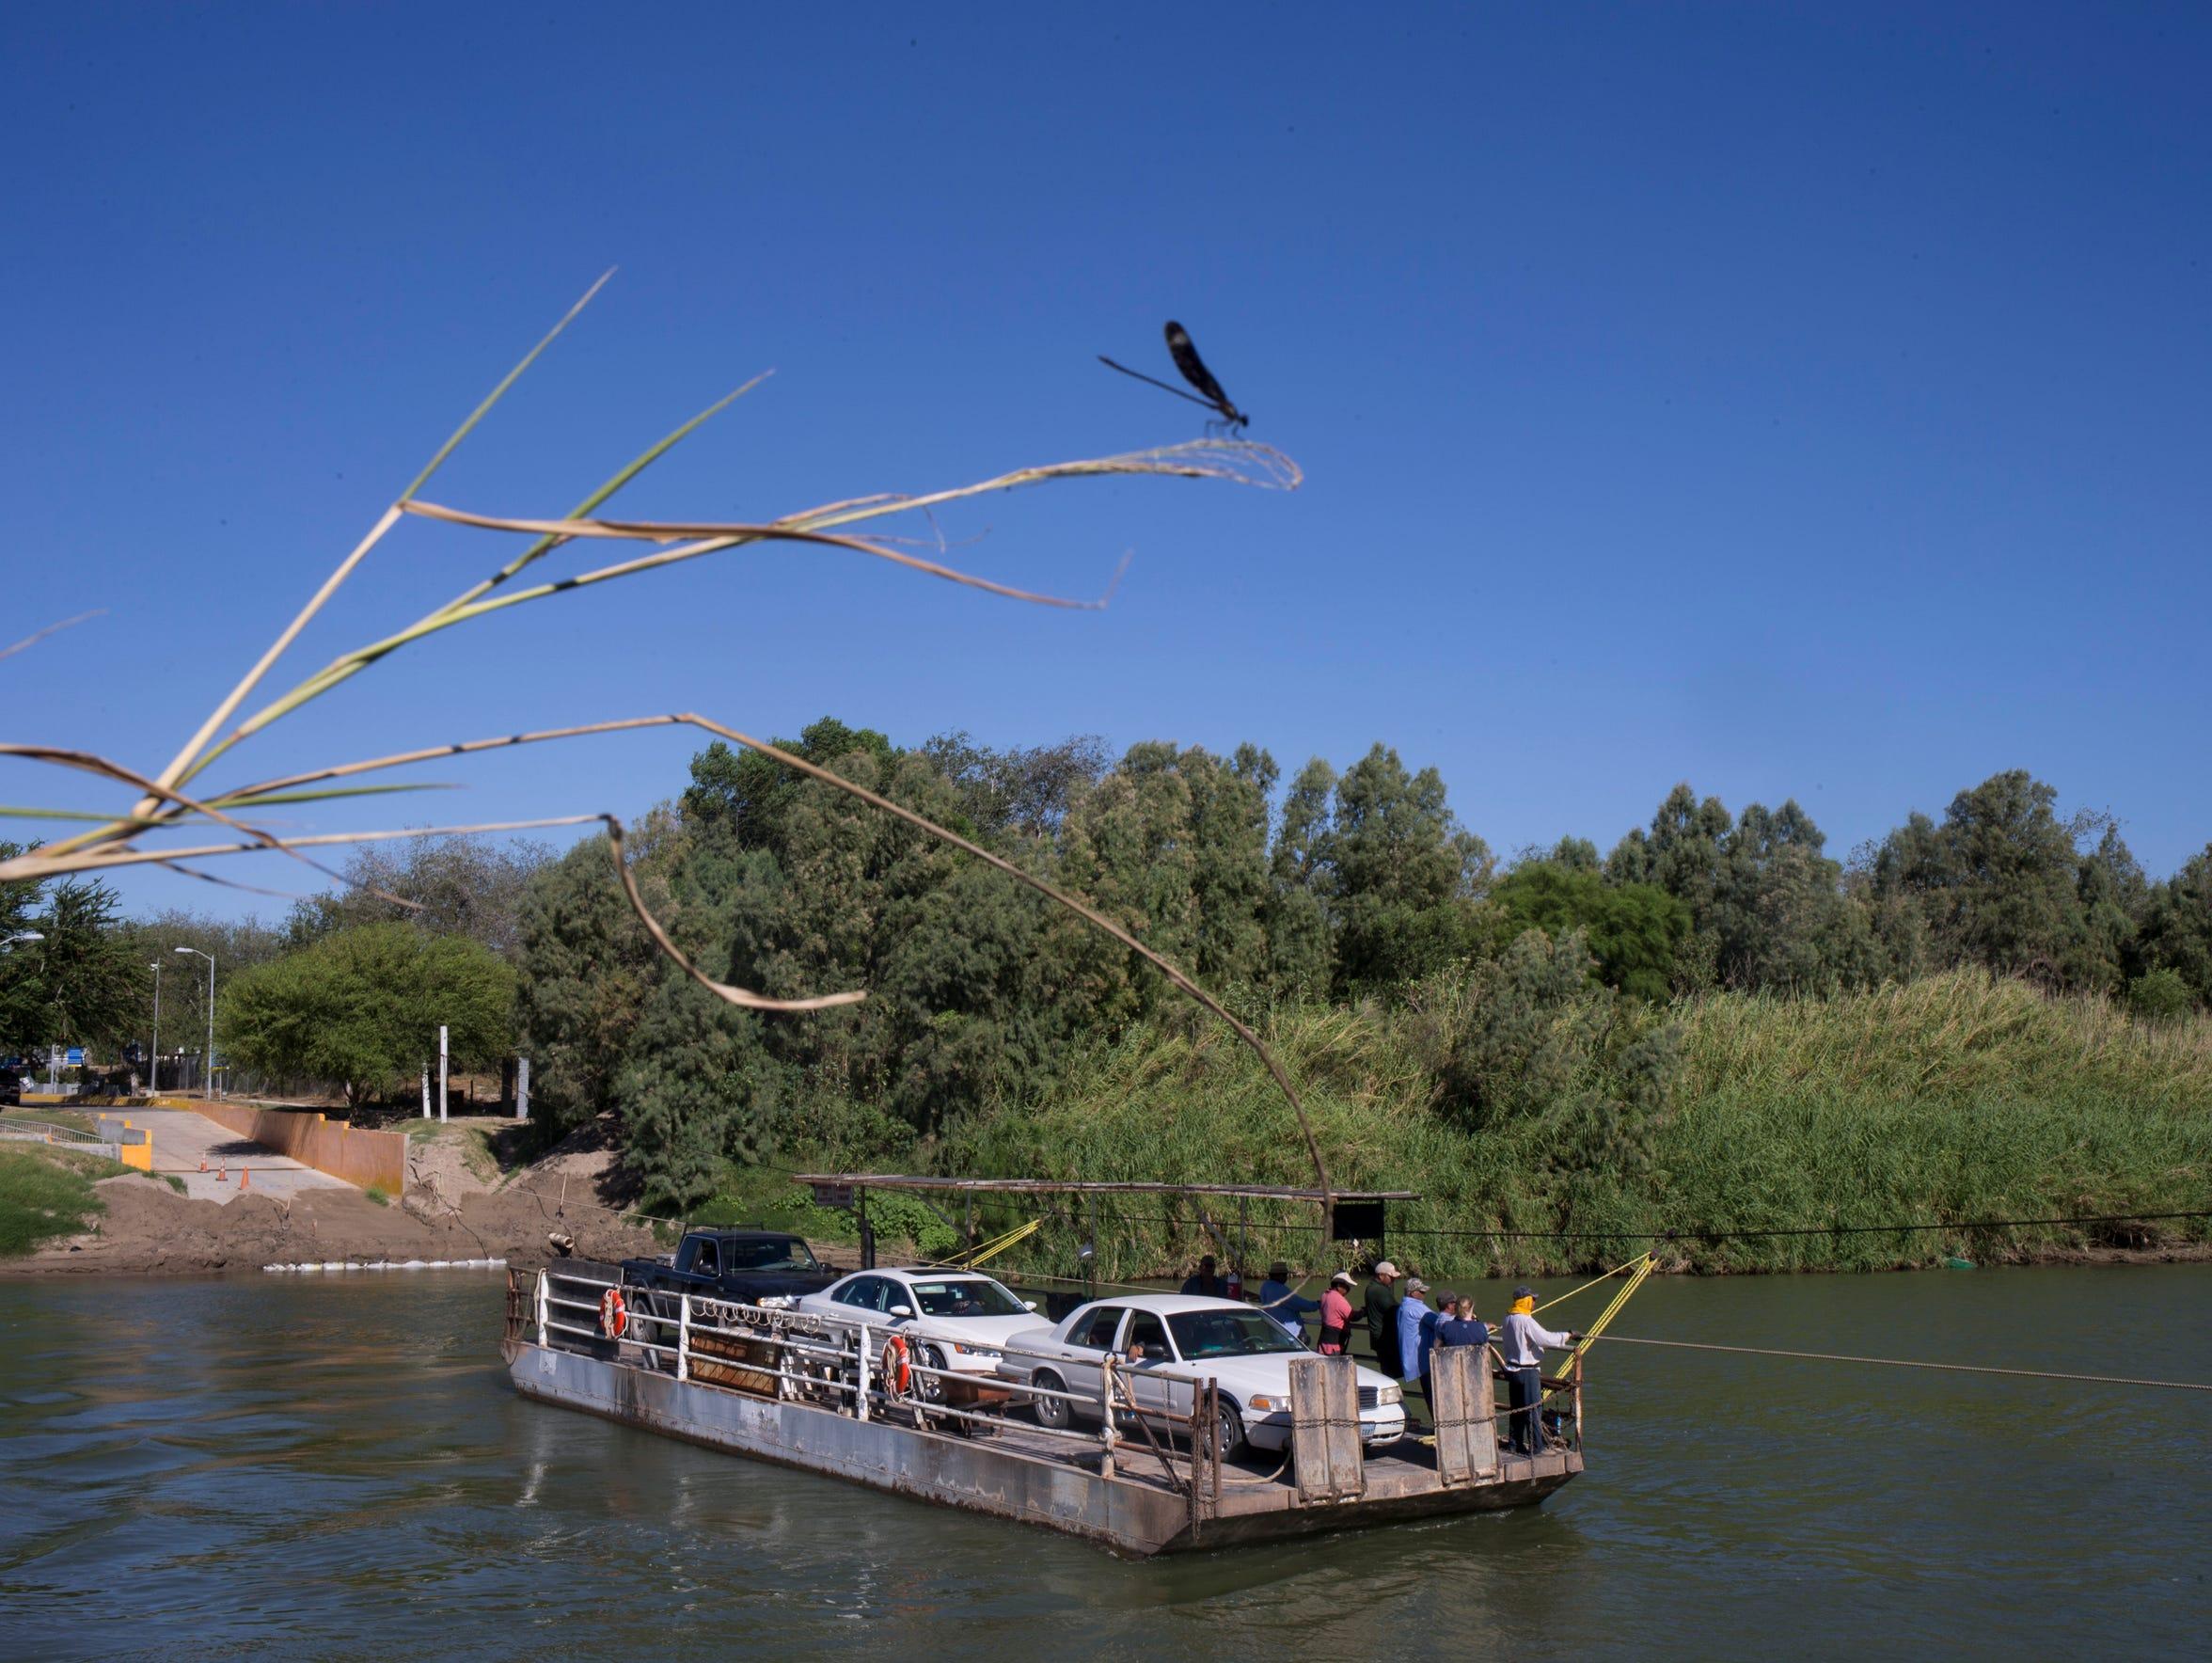 The Los Ebanos ferry carries three vehicles per trip